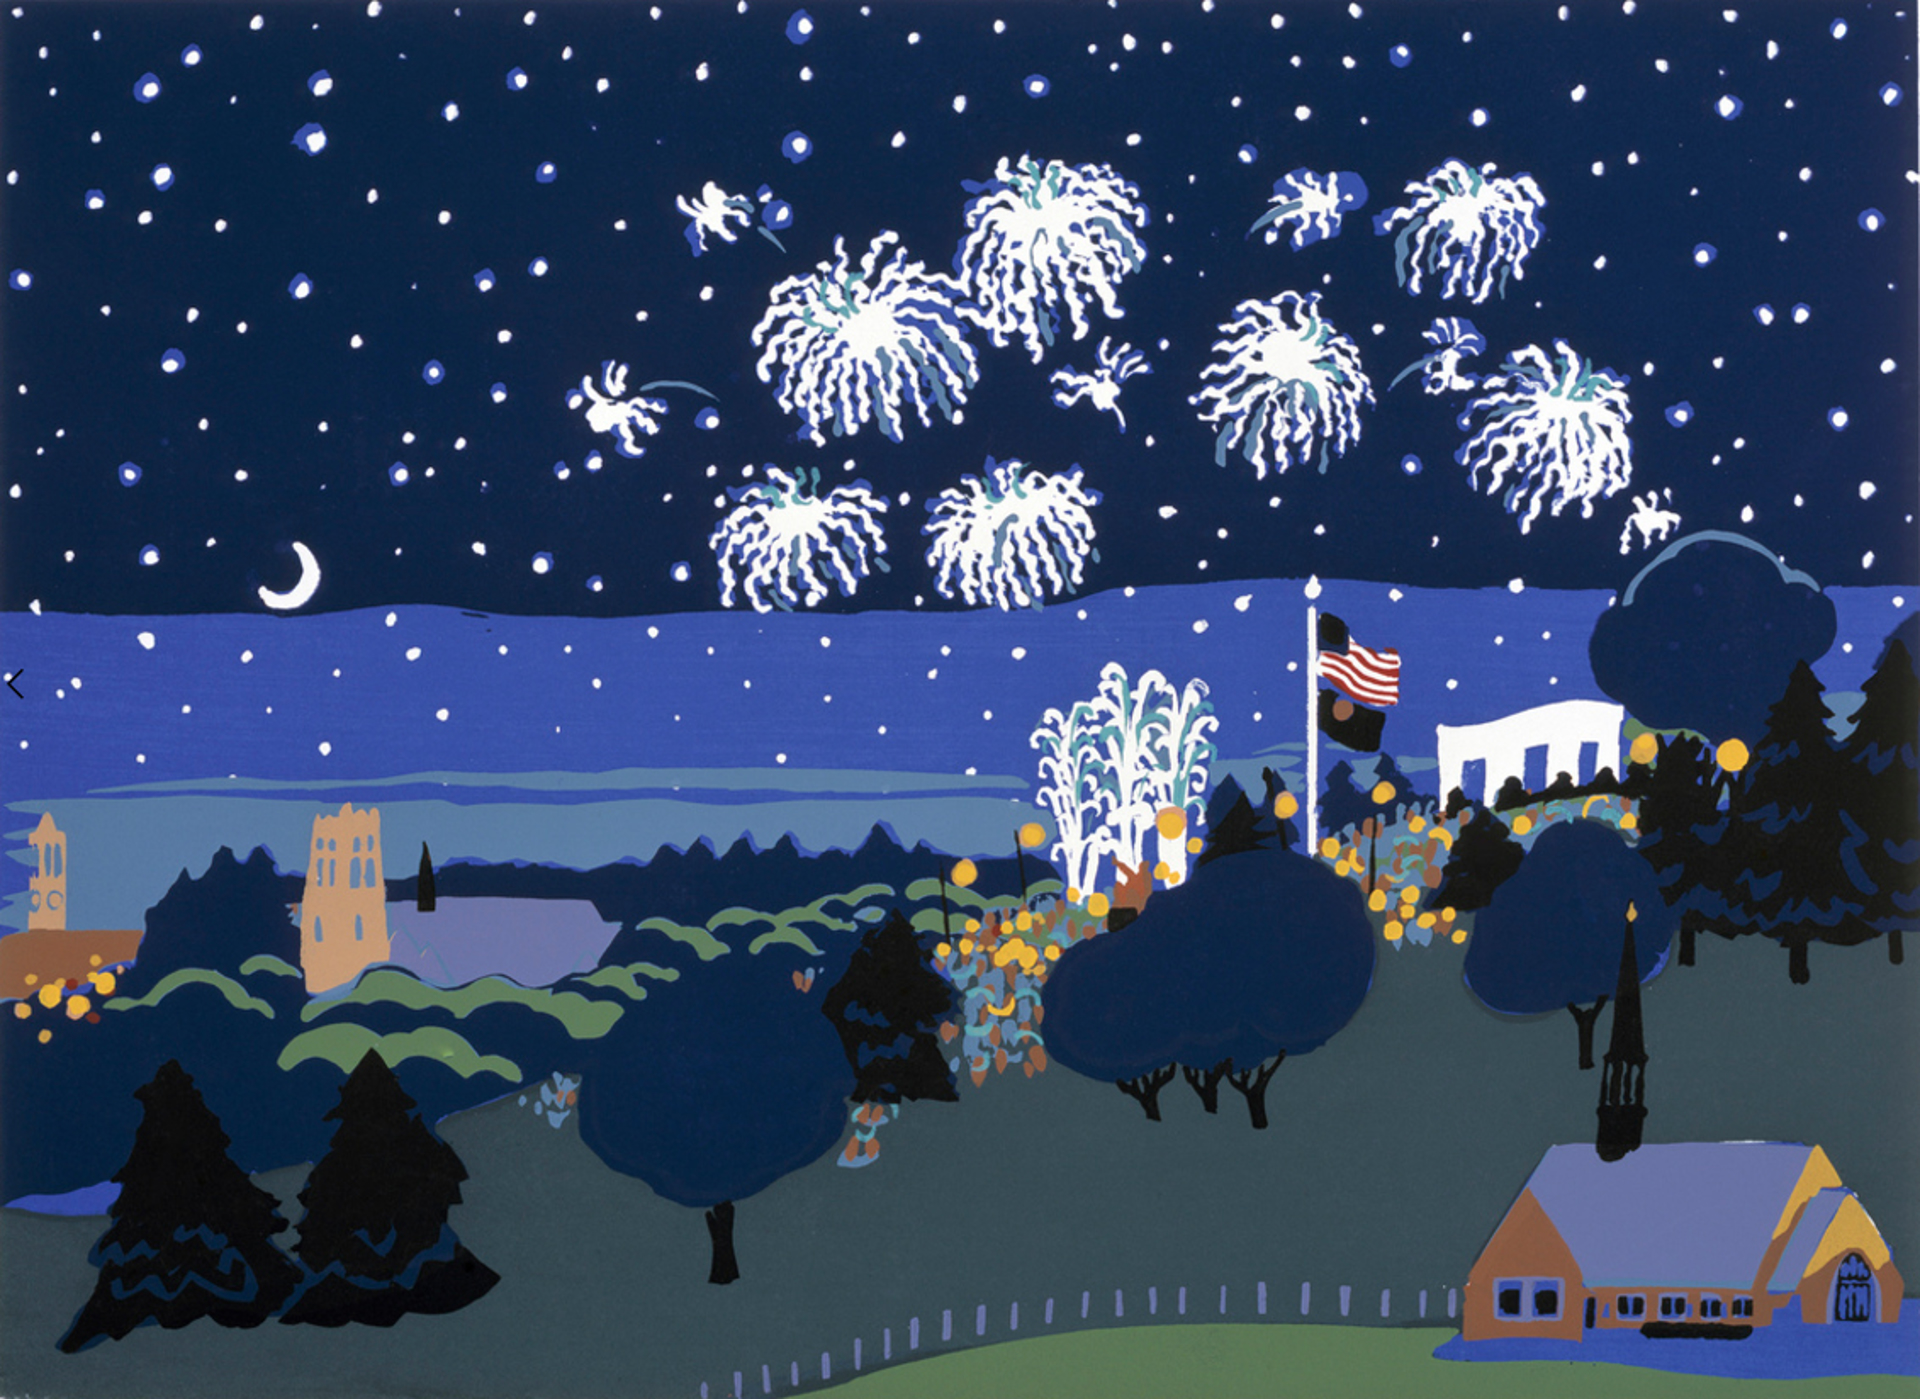 4th of July, Memorial Park by Judith Welk